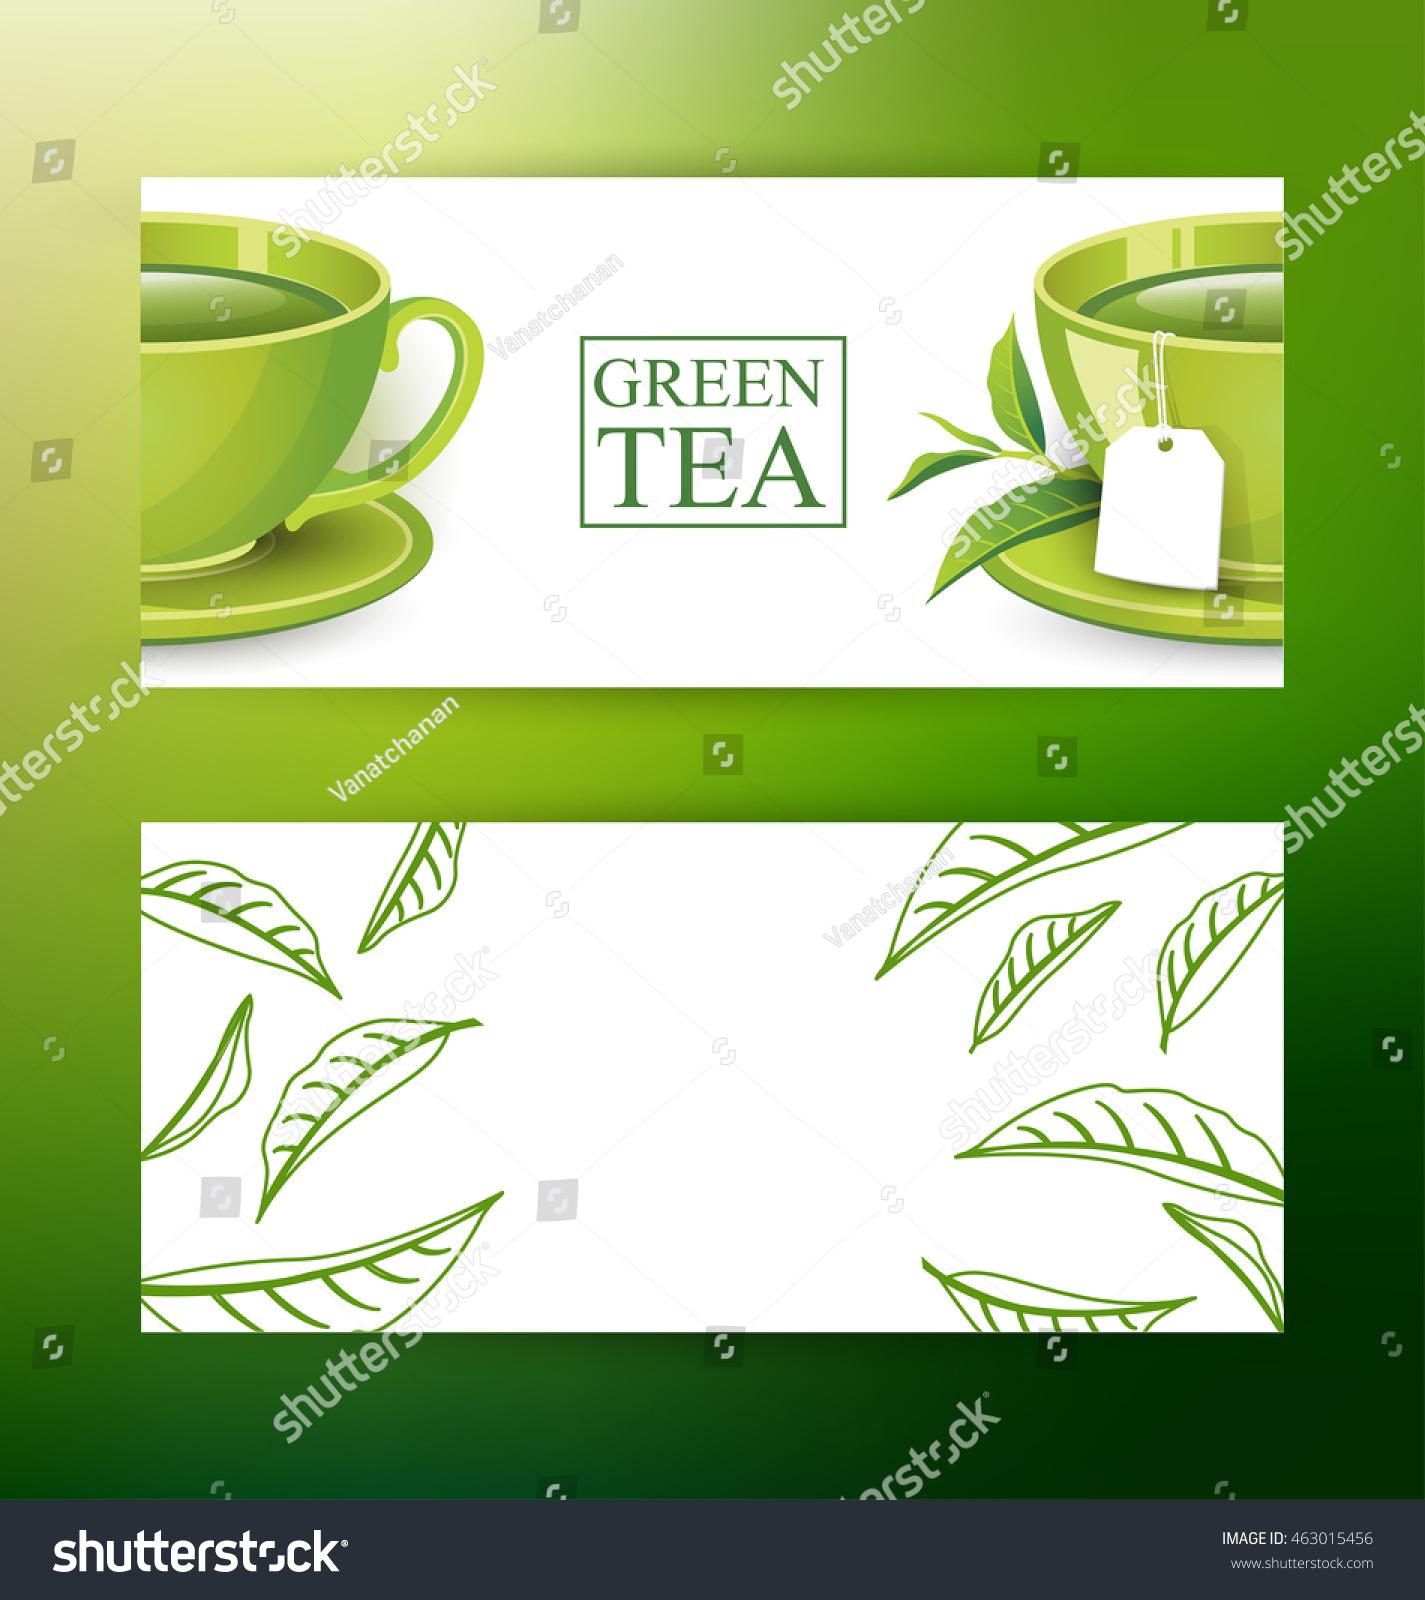 Design banner template - Design Banner Template Green Tea Vector Illustration